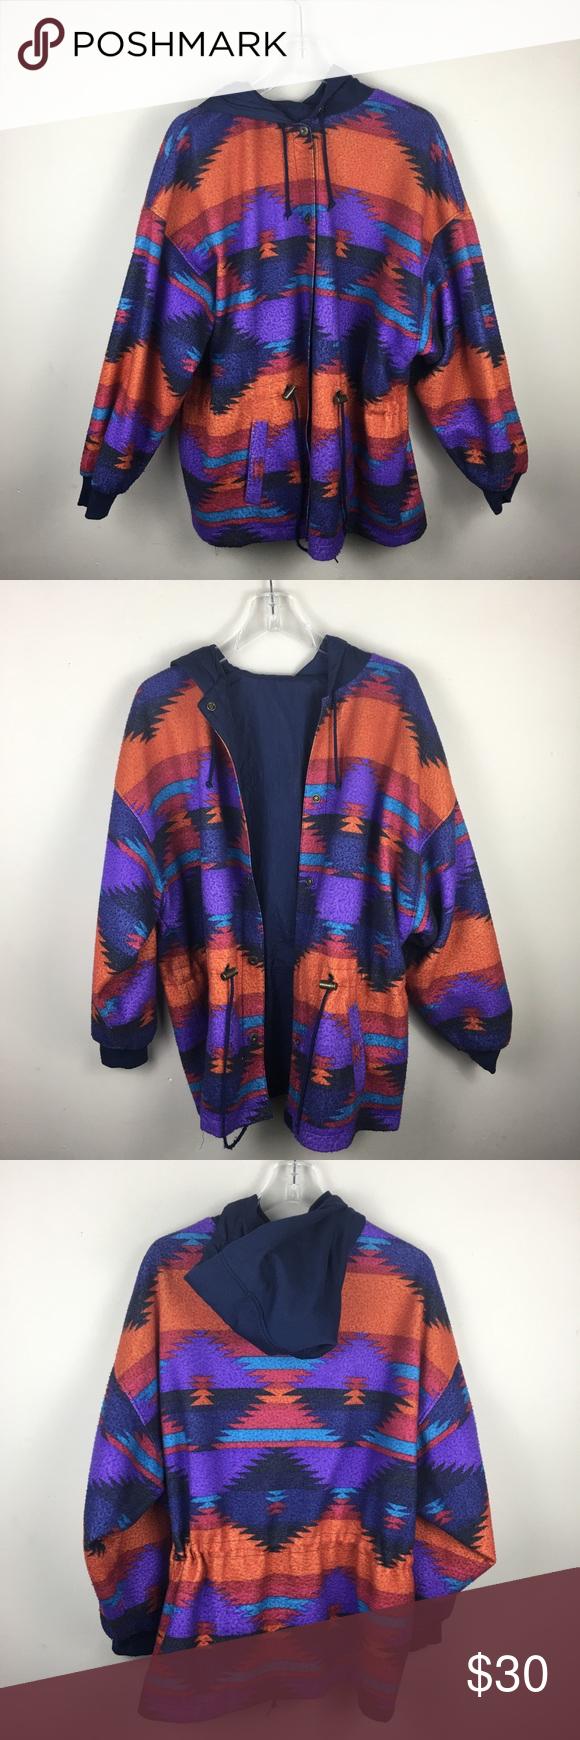 Vintage Karizma reversible parka jacket Parka jacket